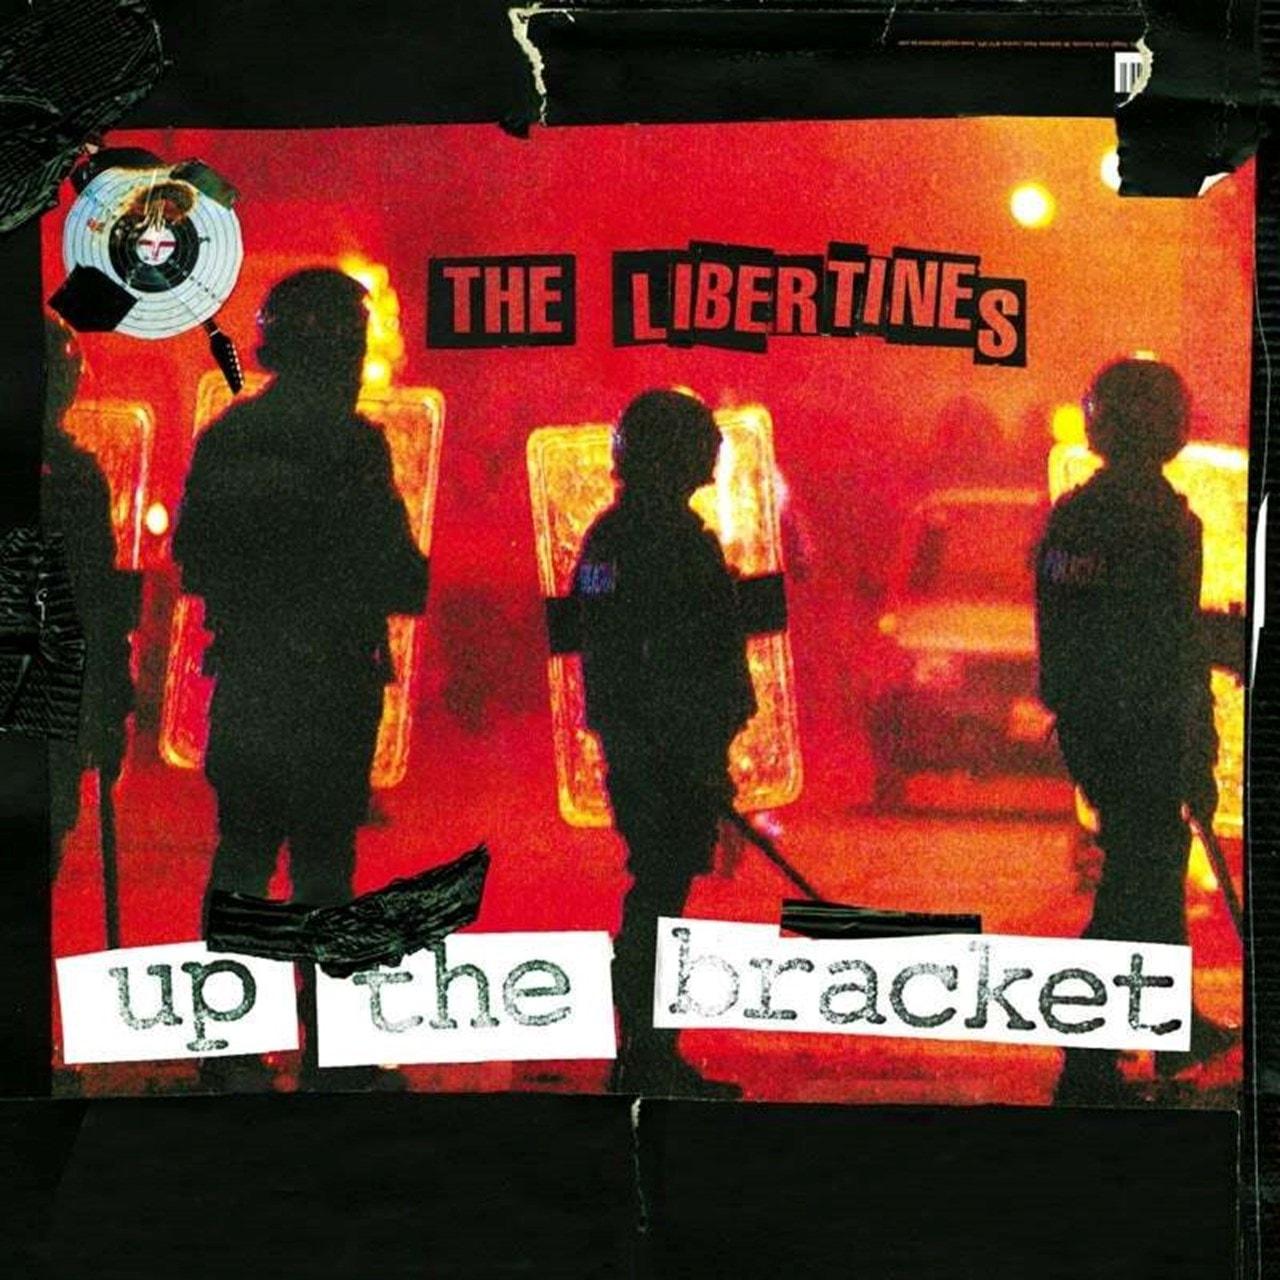 Up the Bracket - 1